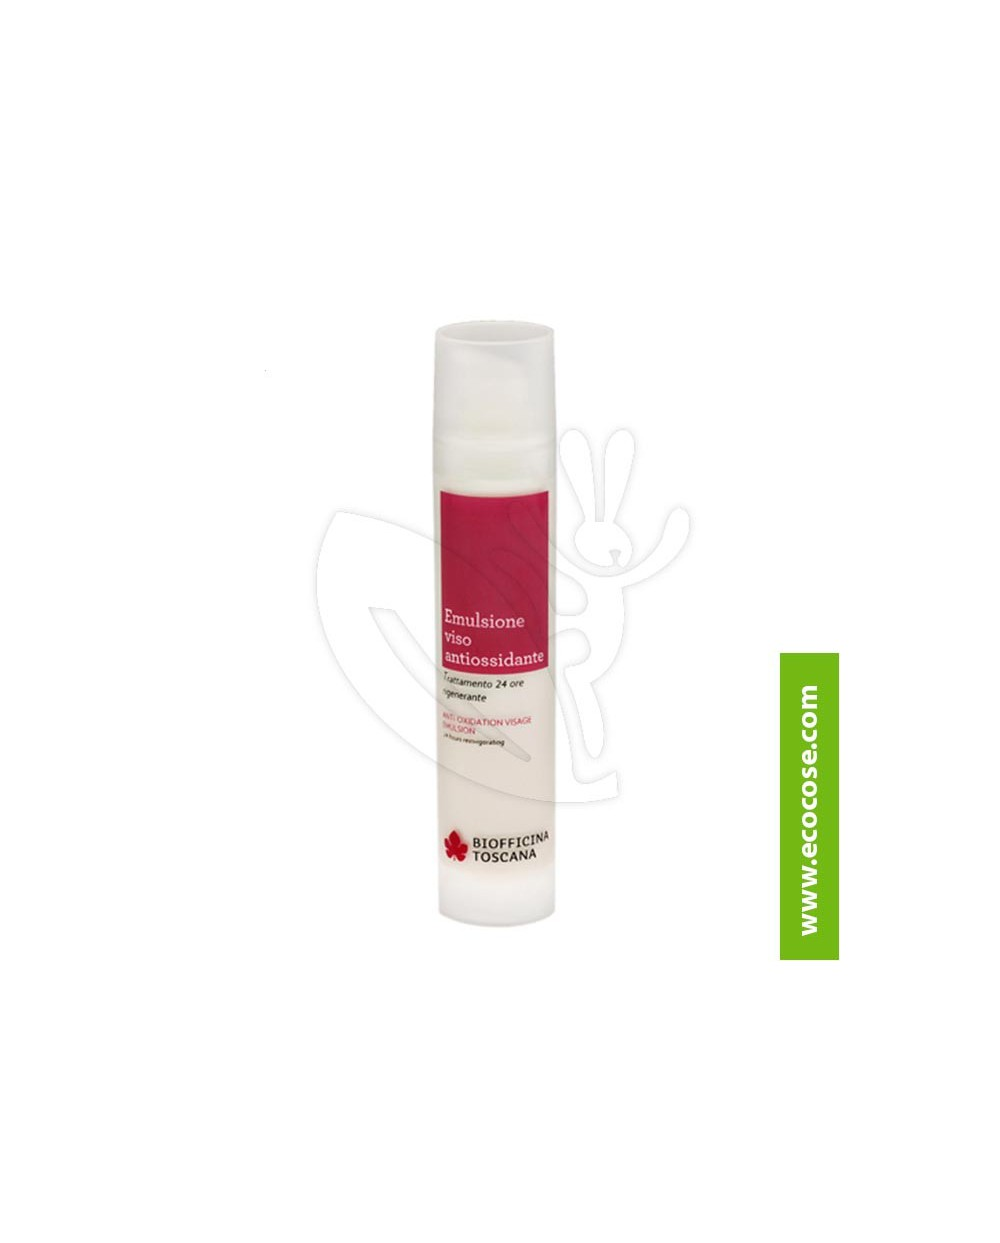 Biofficina Toscana - Emulsione viso antiossidante